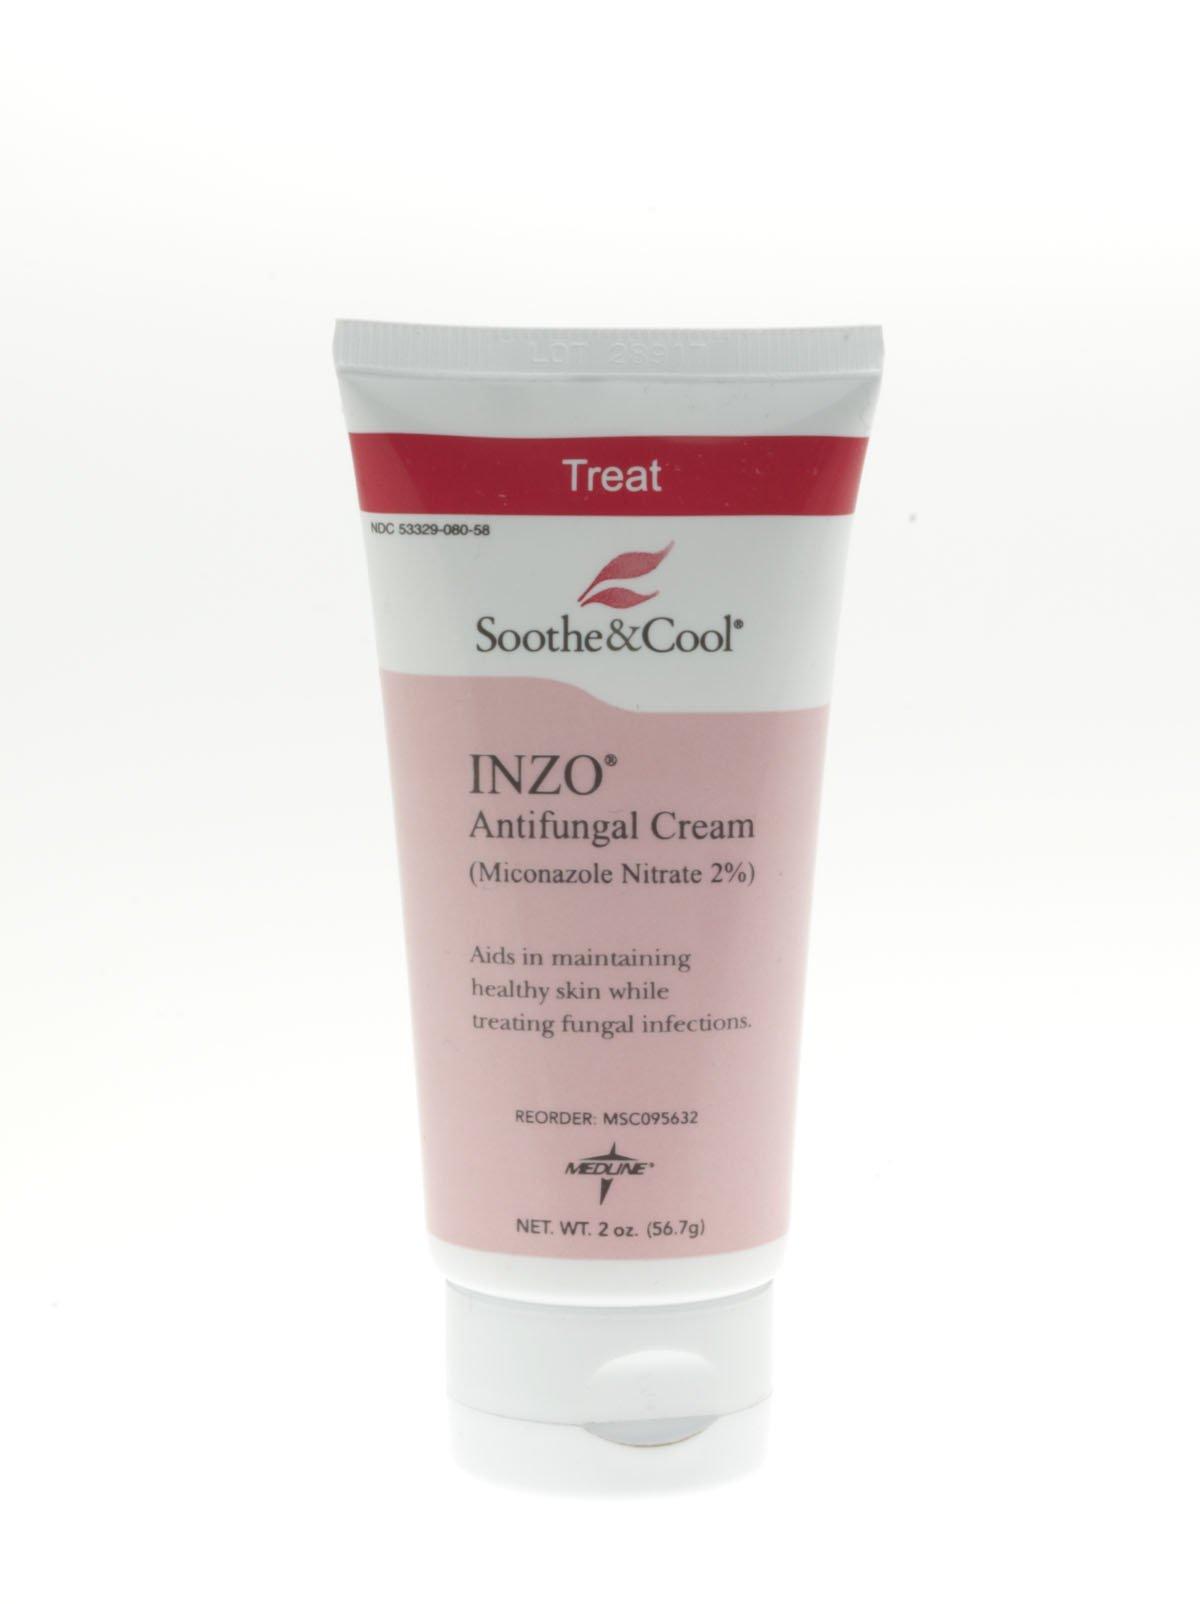 Medline Soothe & Cool INZO Antifungal Cream - INZO Antifungal Cream, 5 oz Tube - Qty of 12